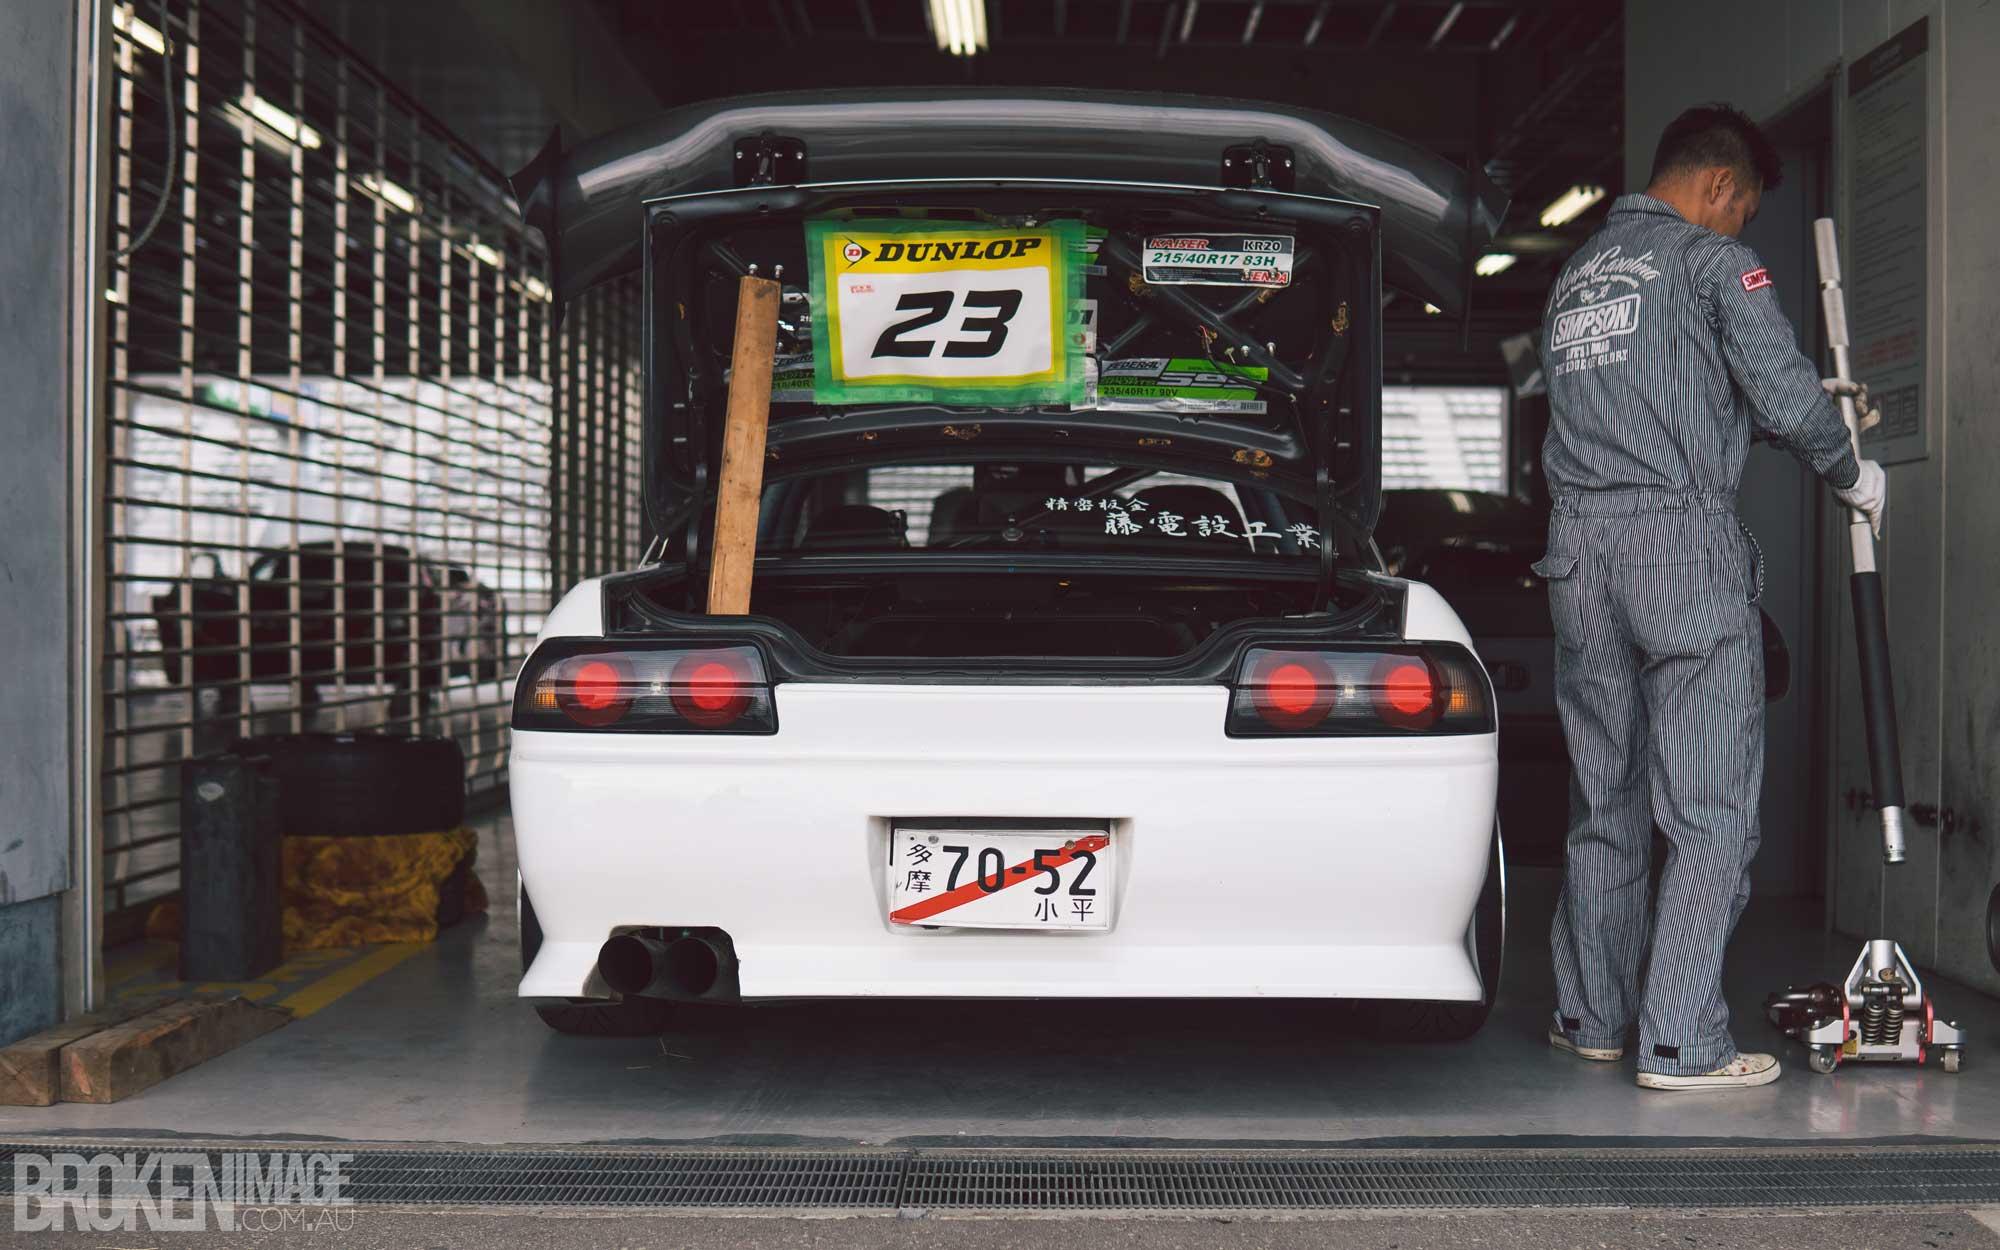 R32 Skyline at Fuji Speedway